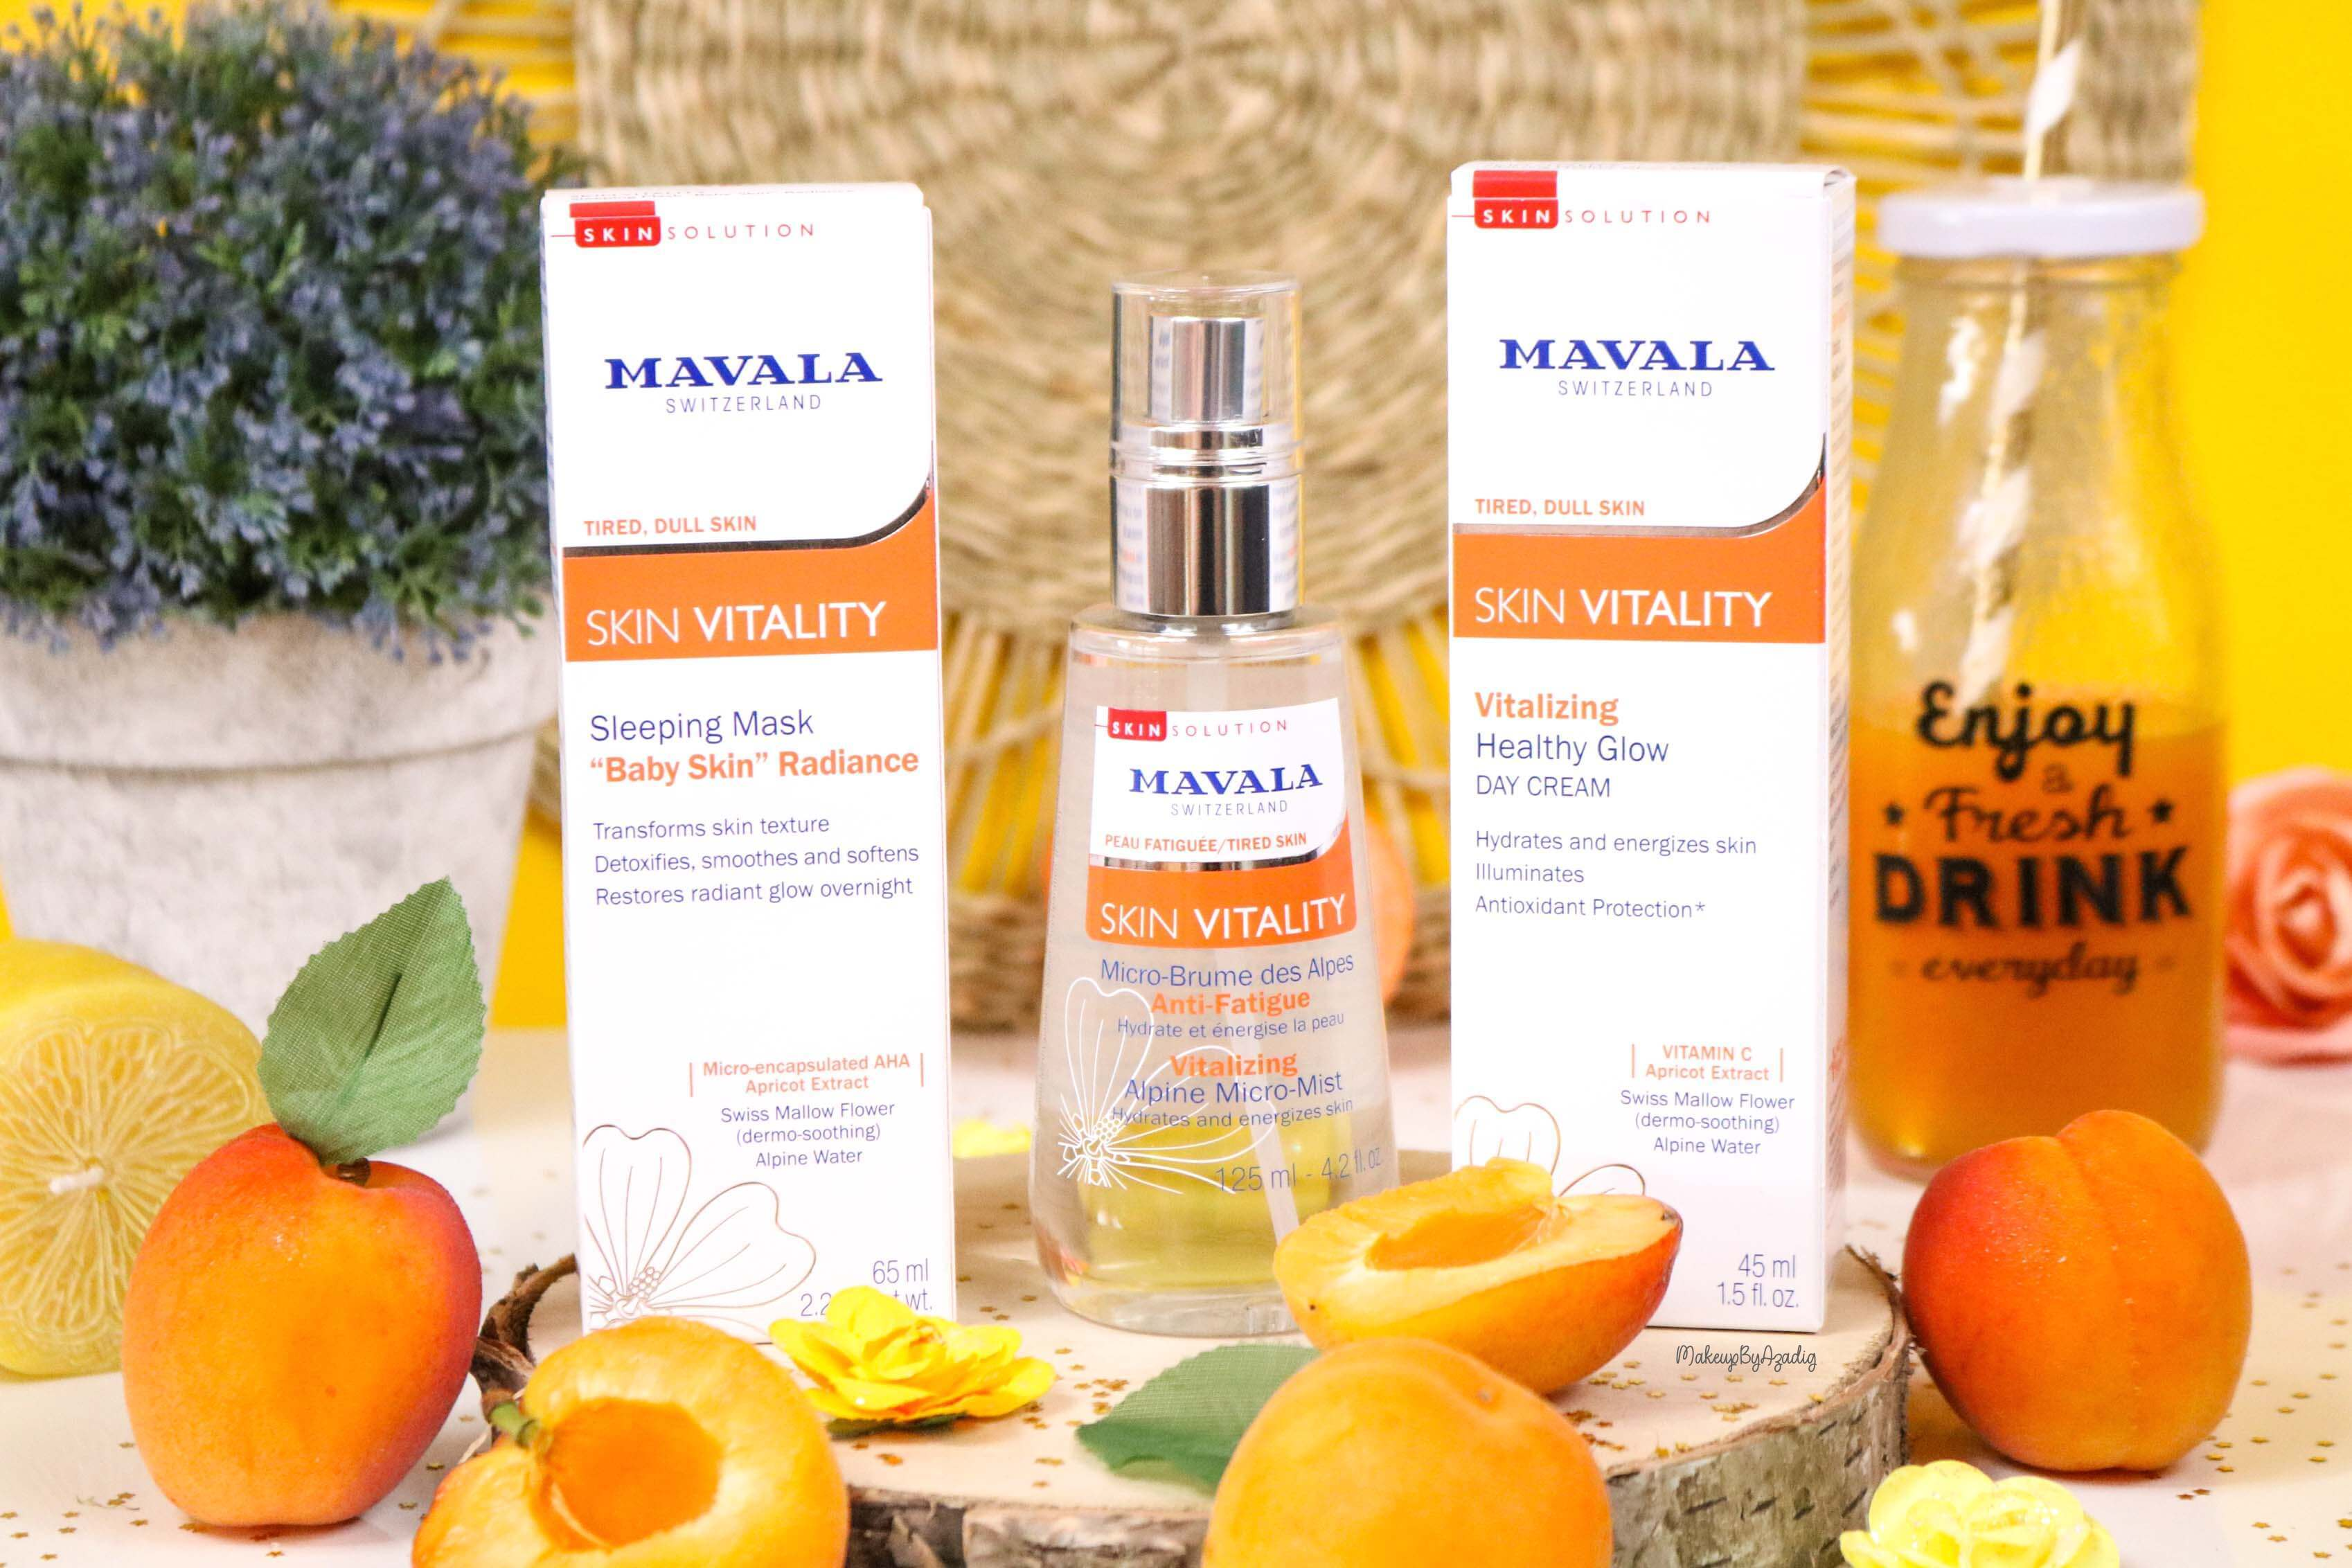 revue-routine-soin-bio-efficace-peau-sensible-skin-vitality-mavala-suisse-masque-nuit-serum-creme-jour-makeupbyazadig-abricot